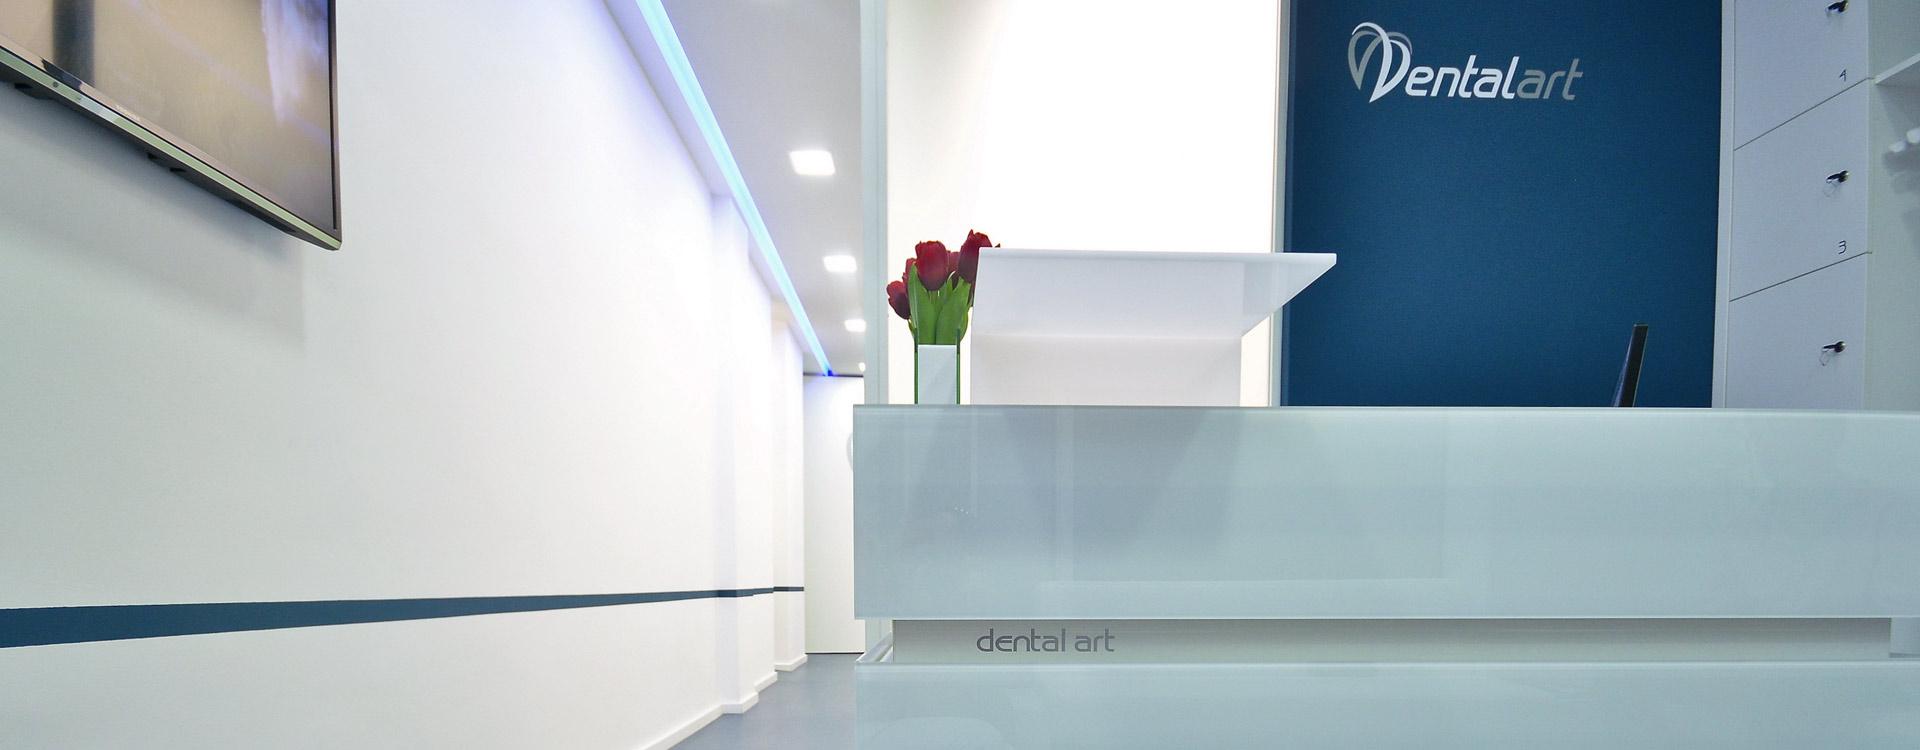 dental-art-stomatoloska-ordinacija-5b